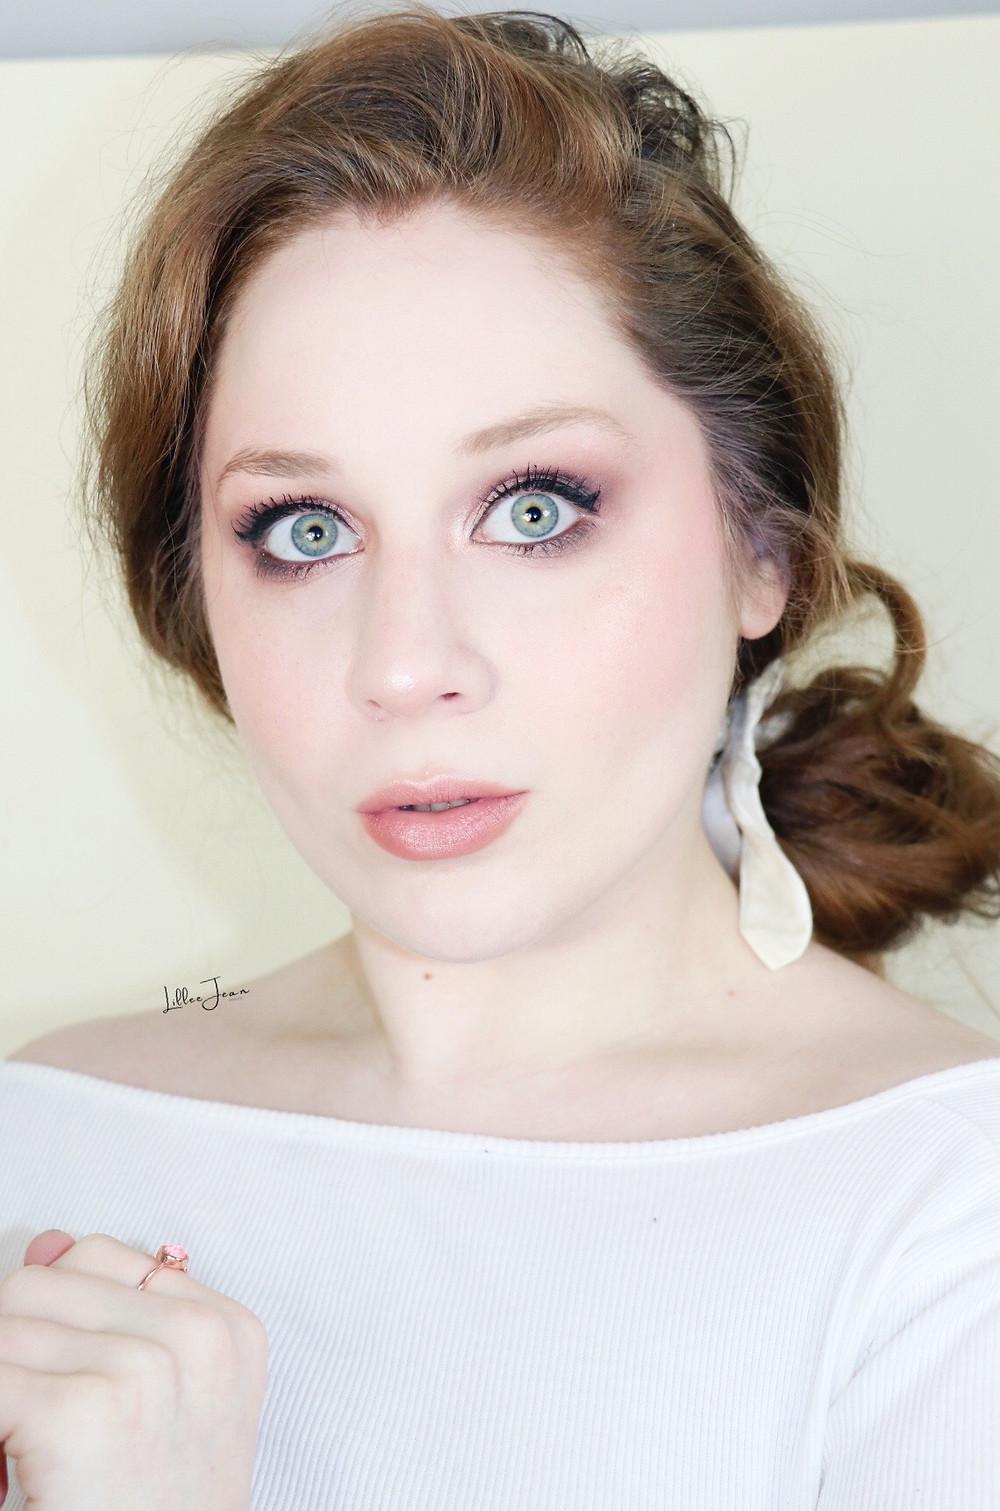 Meghan Markle Inspired Smokey Makeup Revolution Reloaded Makeup Tutorial 2021 | Lillee Jean